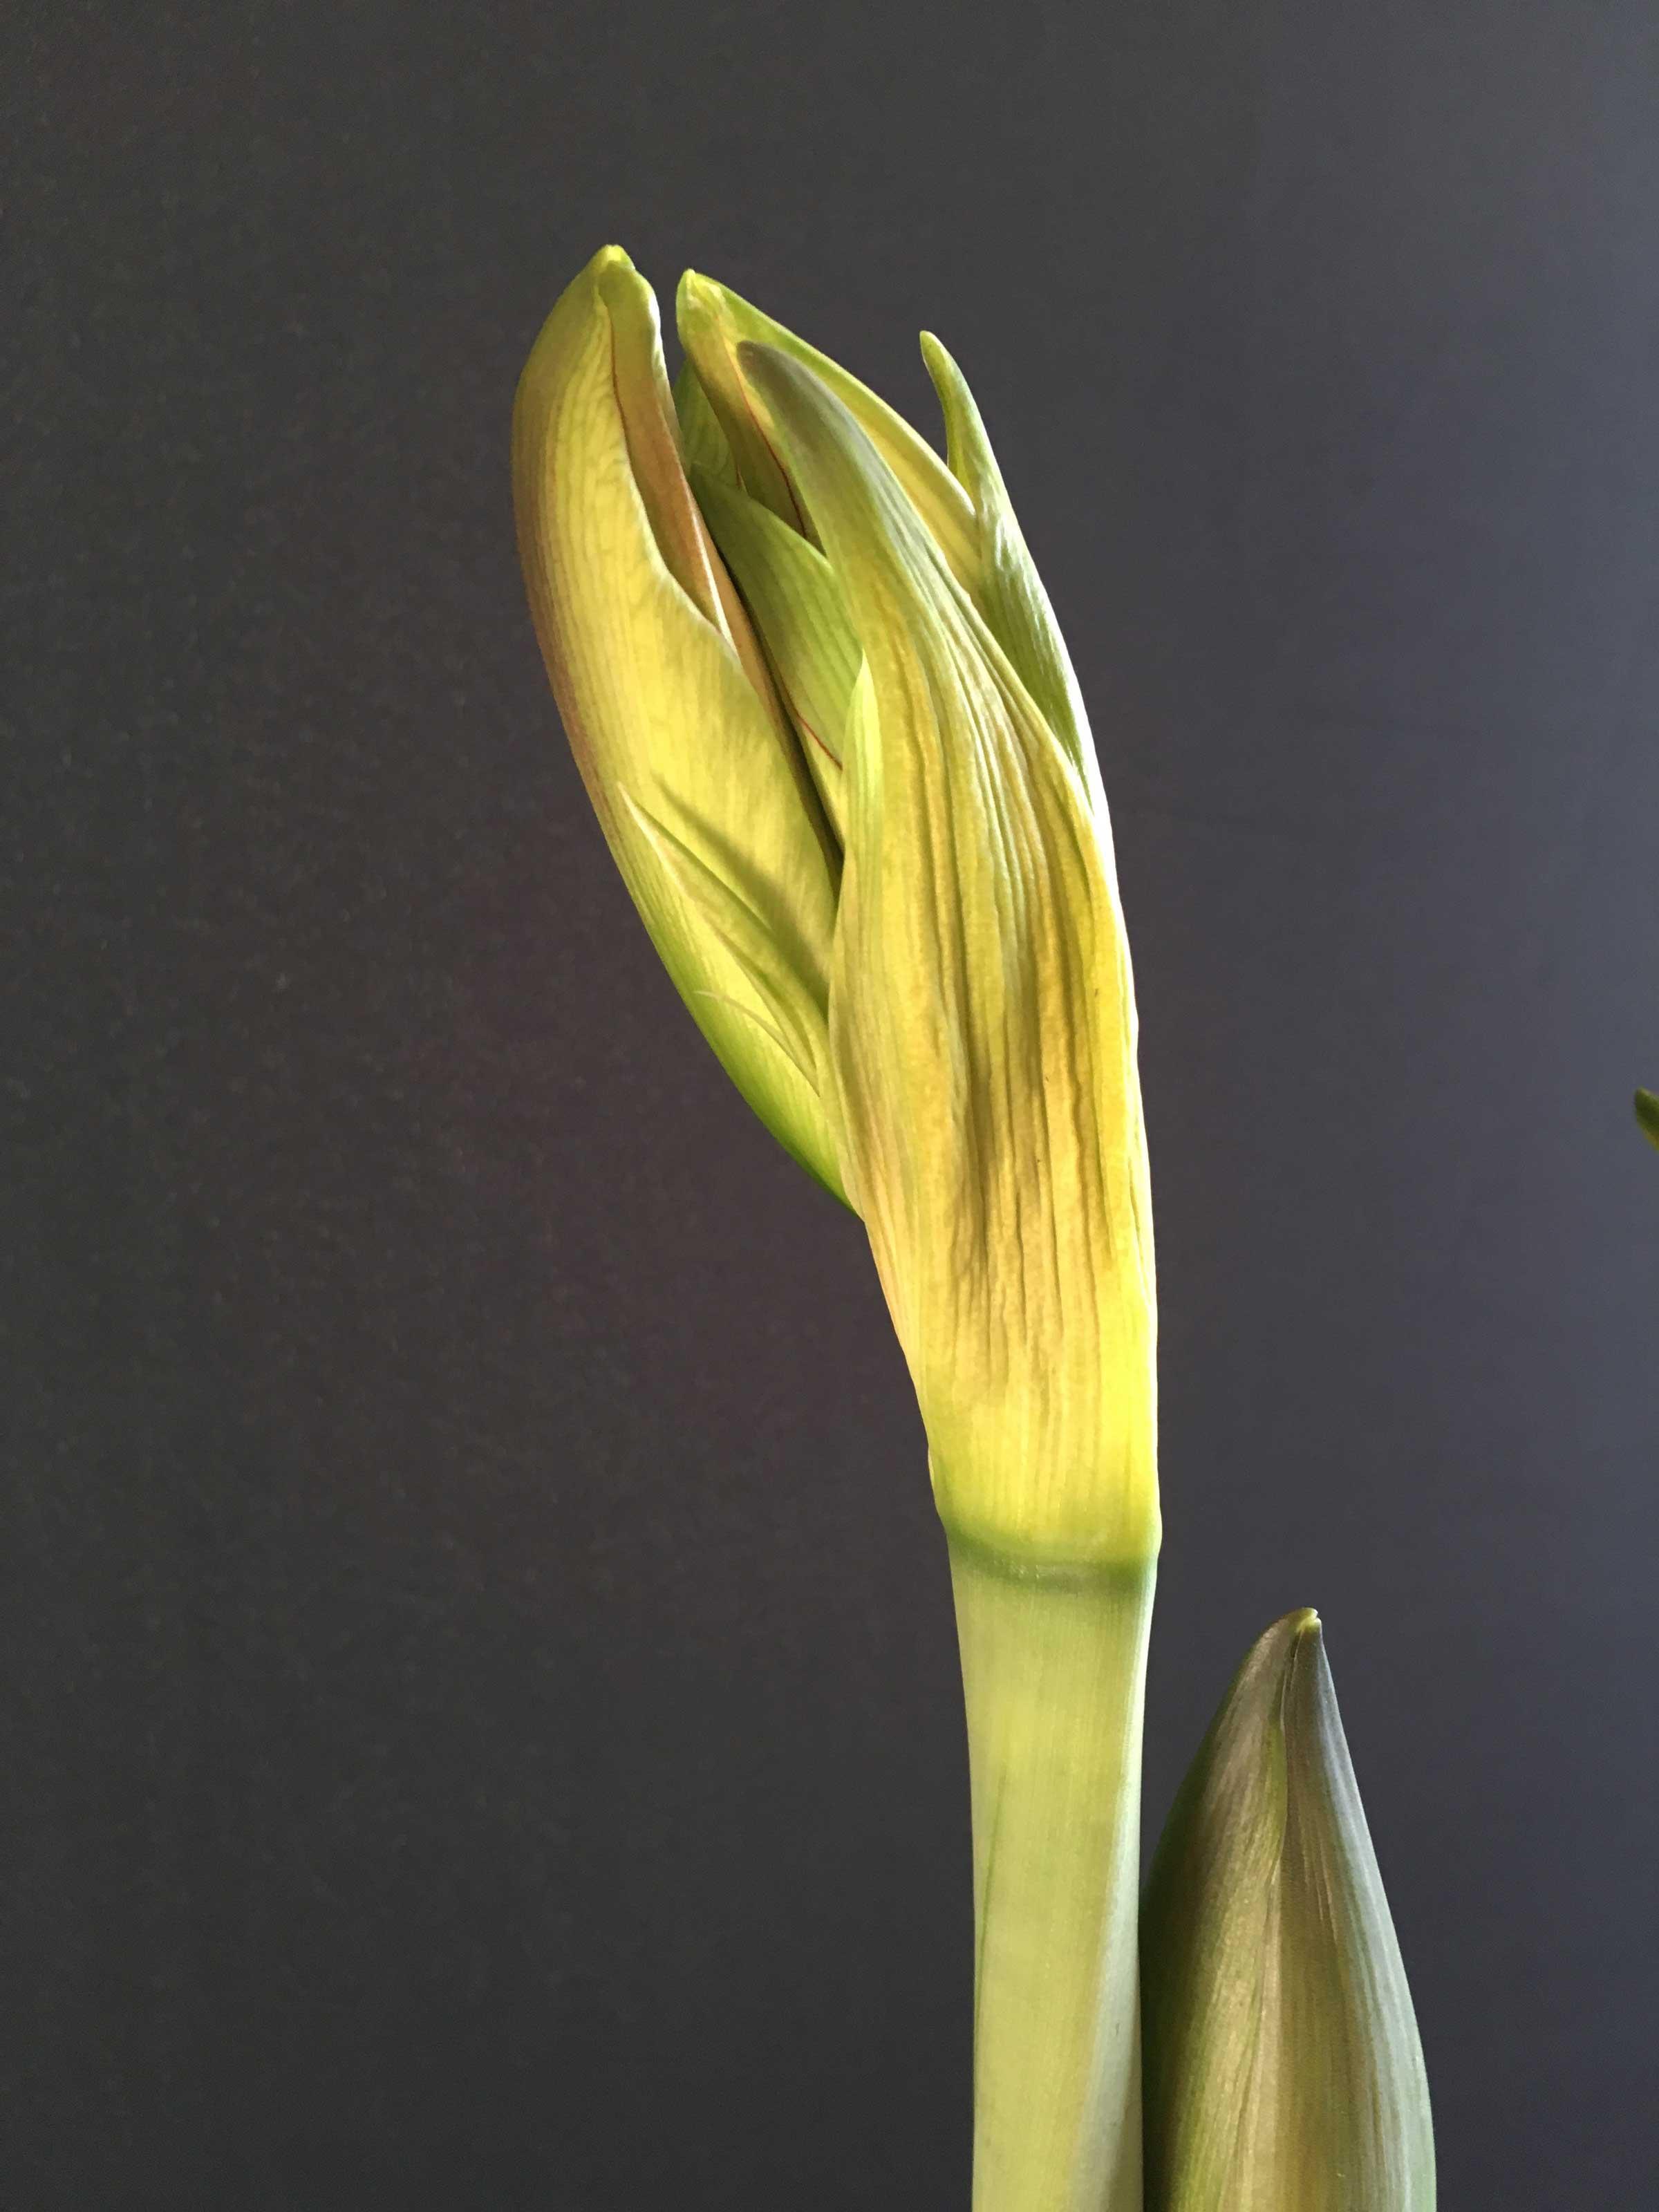 Amaryllis-Beauty-of-the-Bud-Longfield-Gardens2.jpg